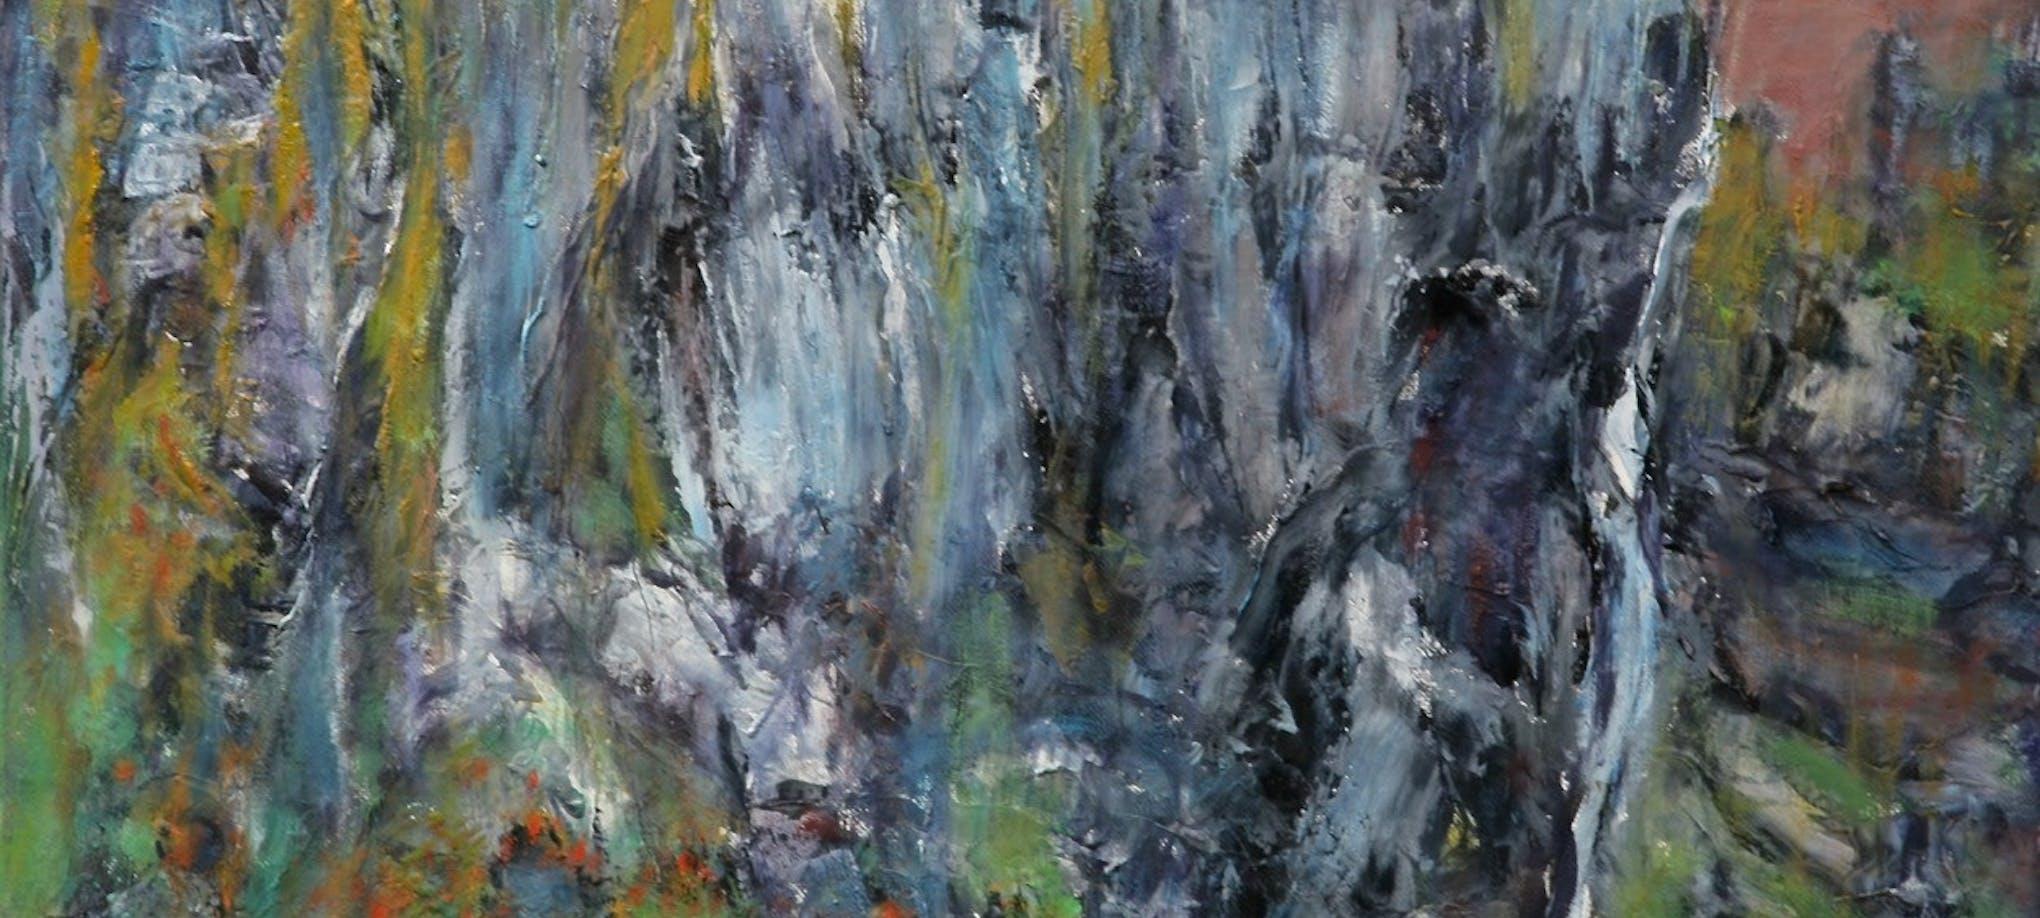 Fjellklippe, 2020, 50 x 65 cm